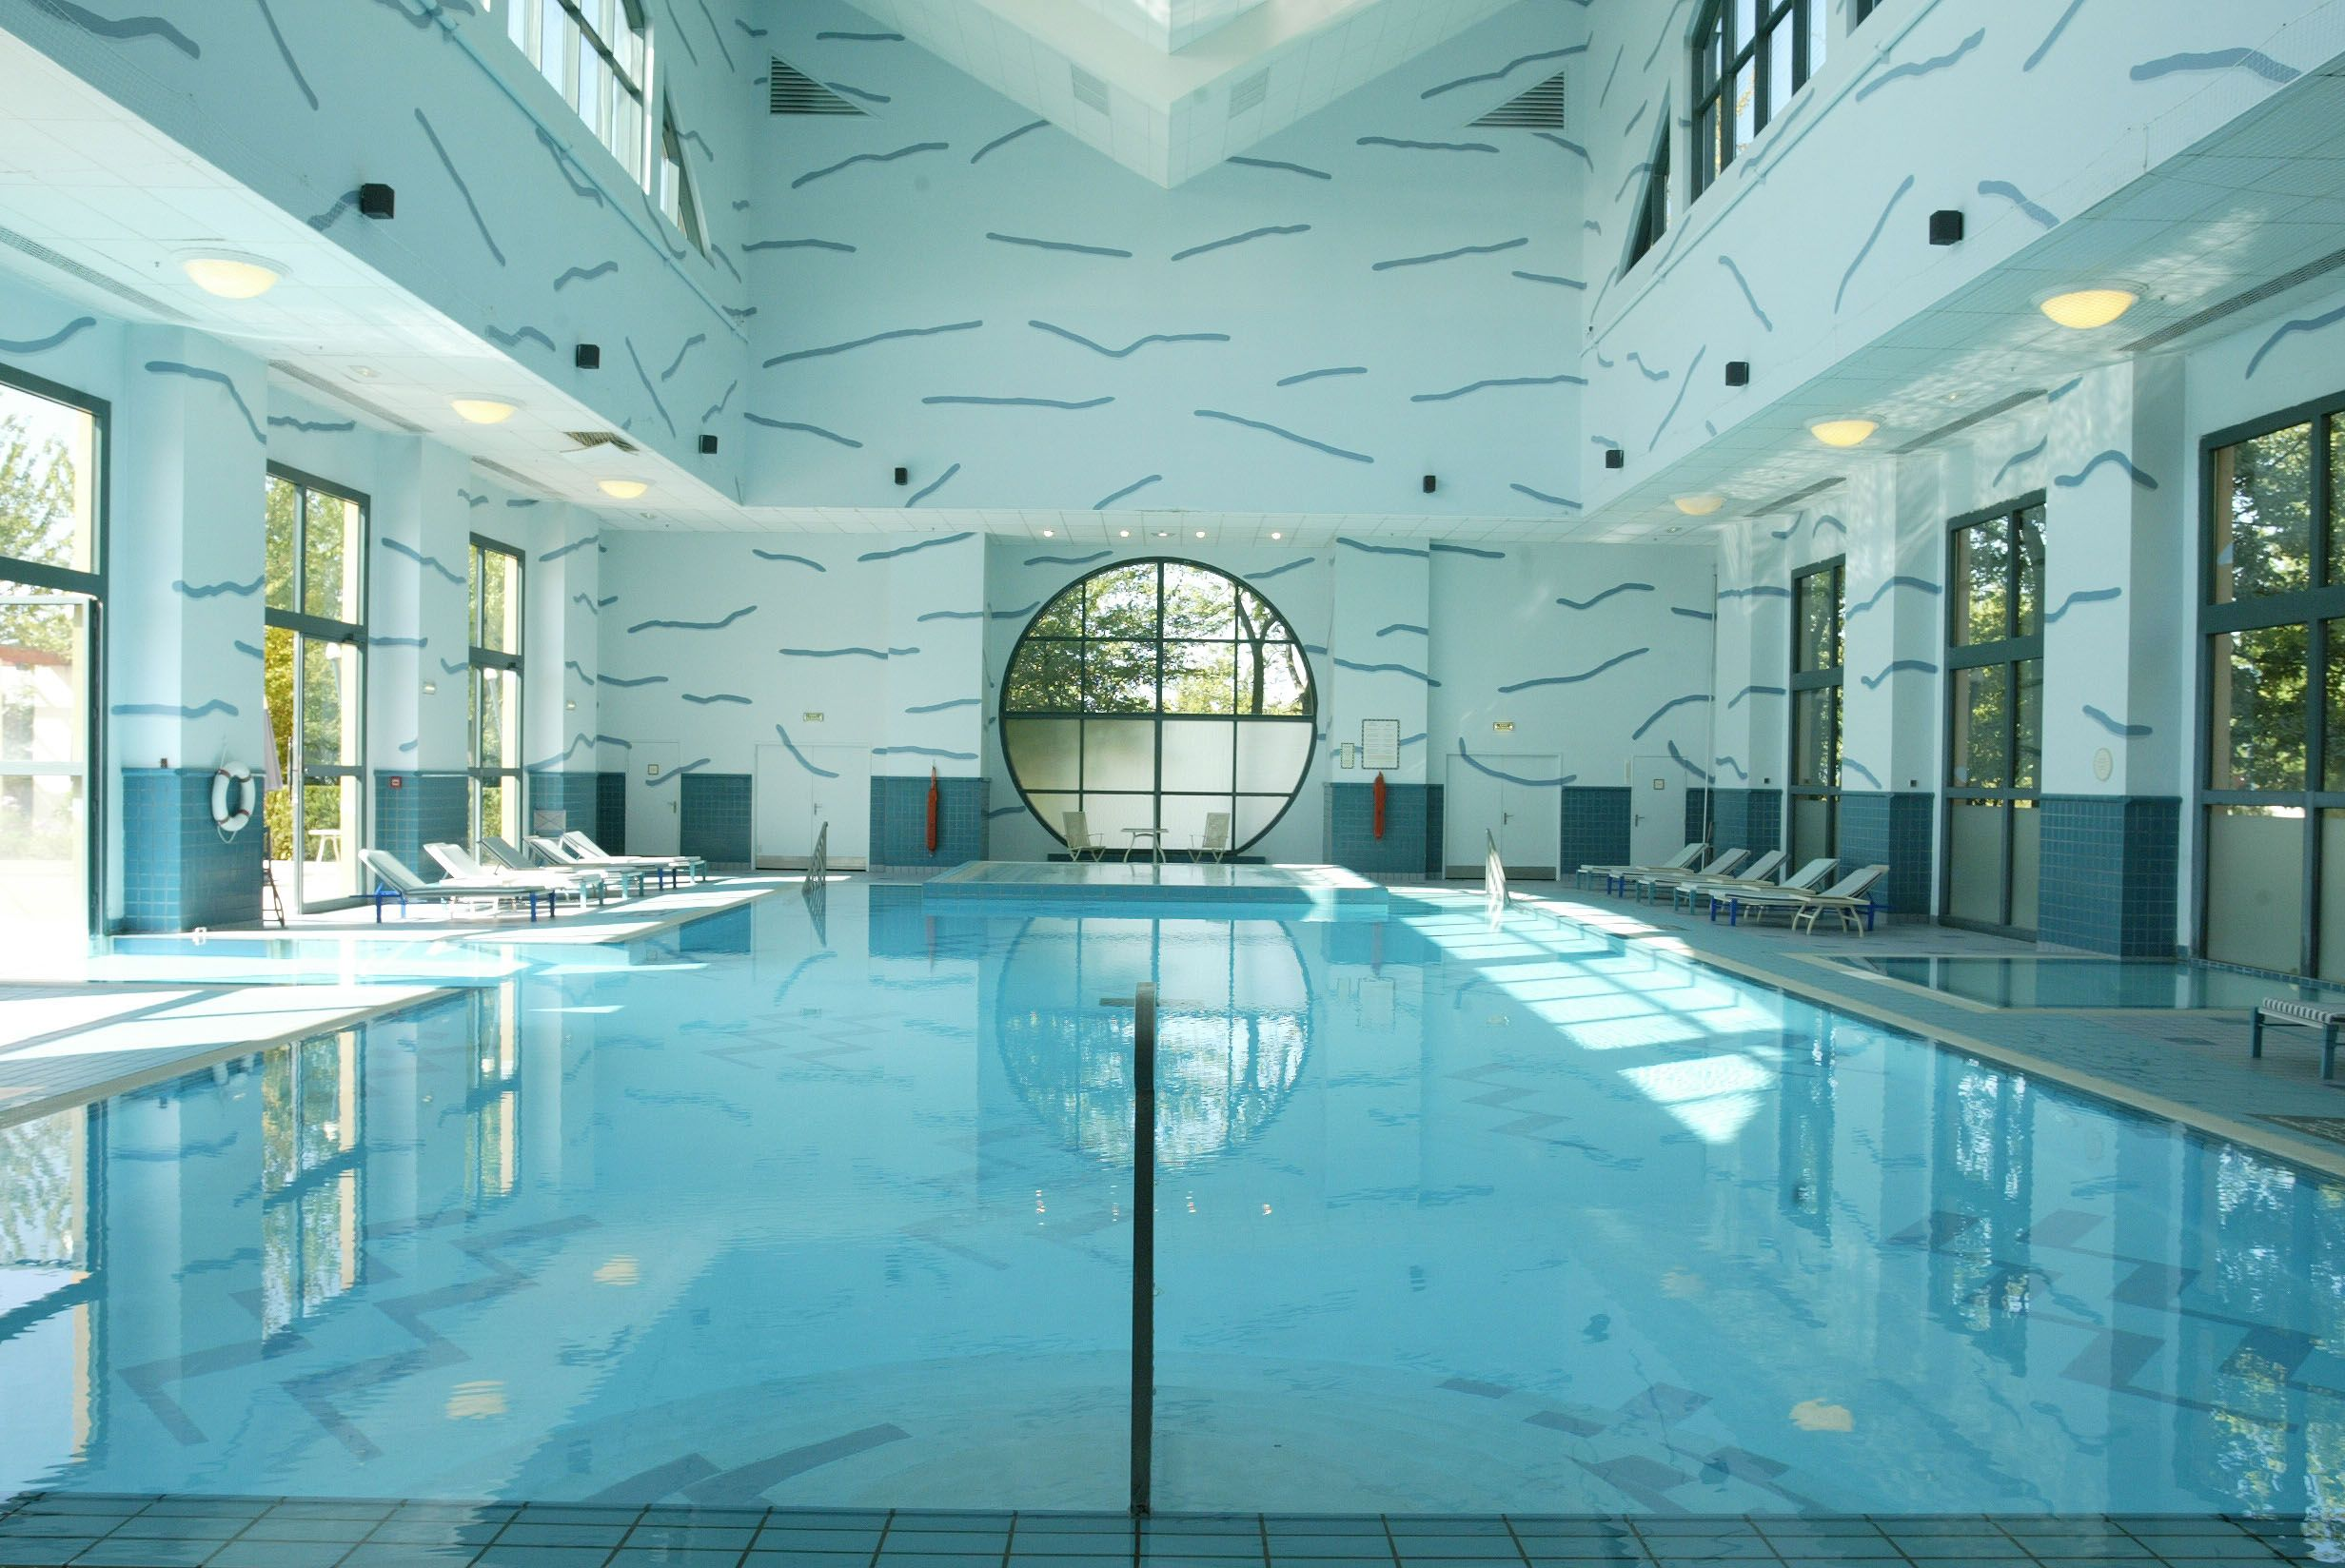 Disney Hotels Hotel New York Indoor Pool Disneyland Paris